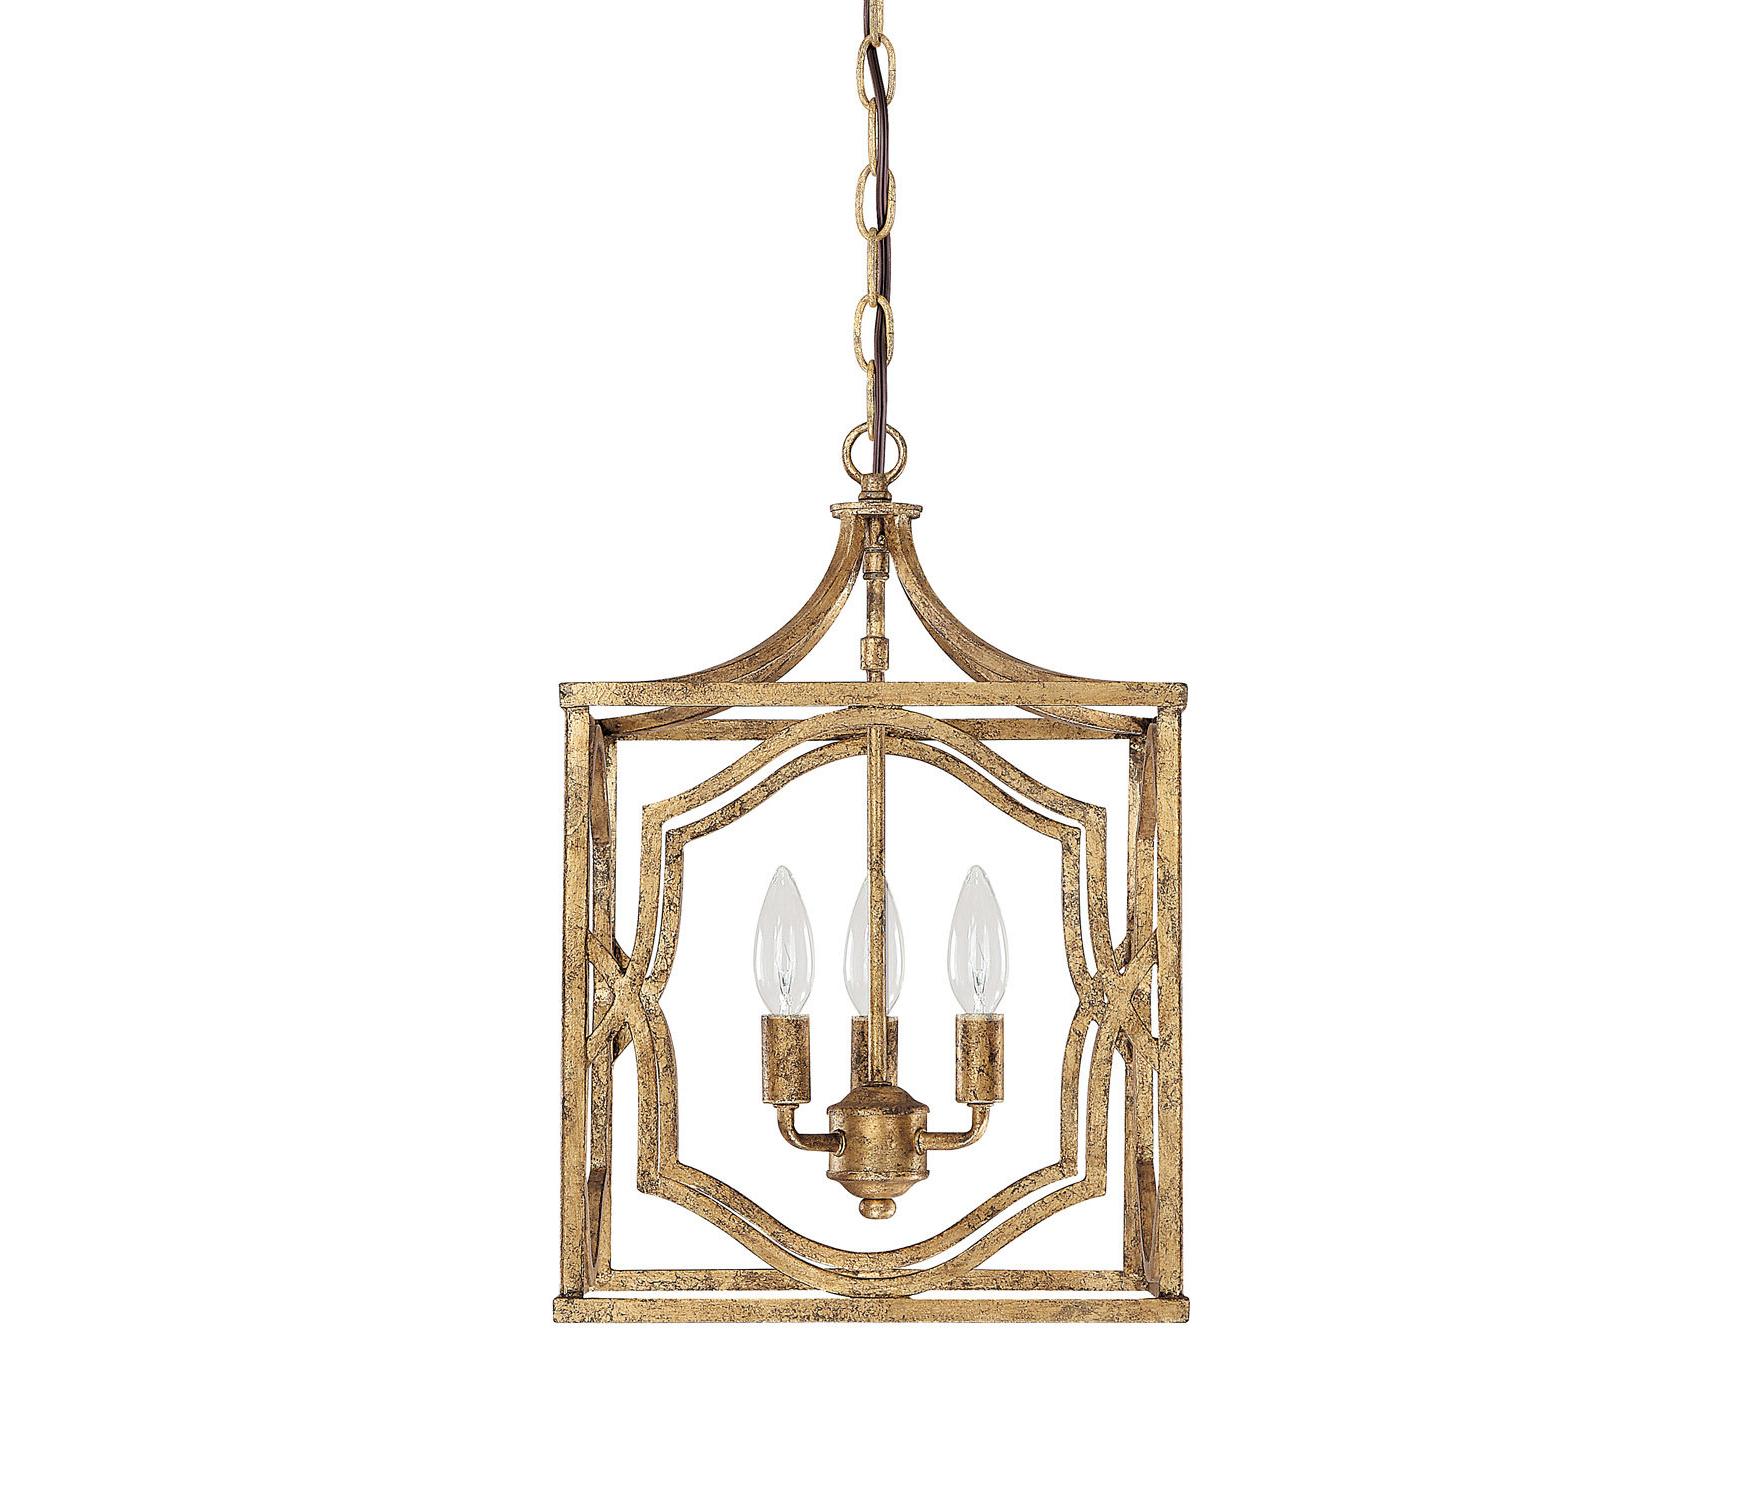 Destrey 3 Light Lantern Square/rectangle Pendant For Widely Used Destrey 3 Light Lantern Square/rectangle Pendants (Gallery 4 of 20)